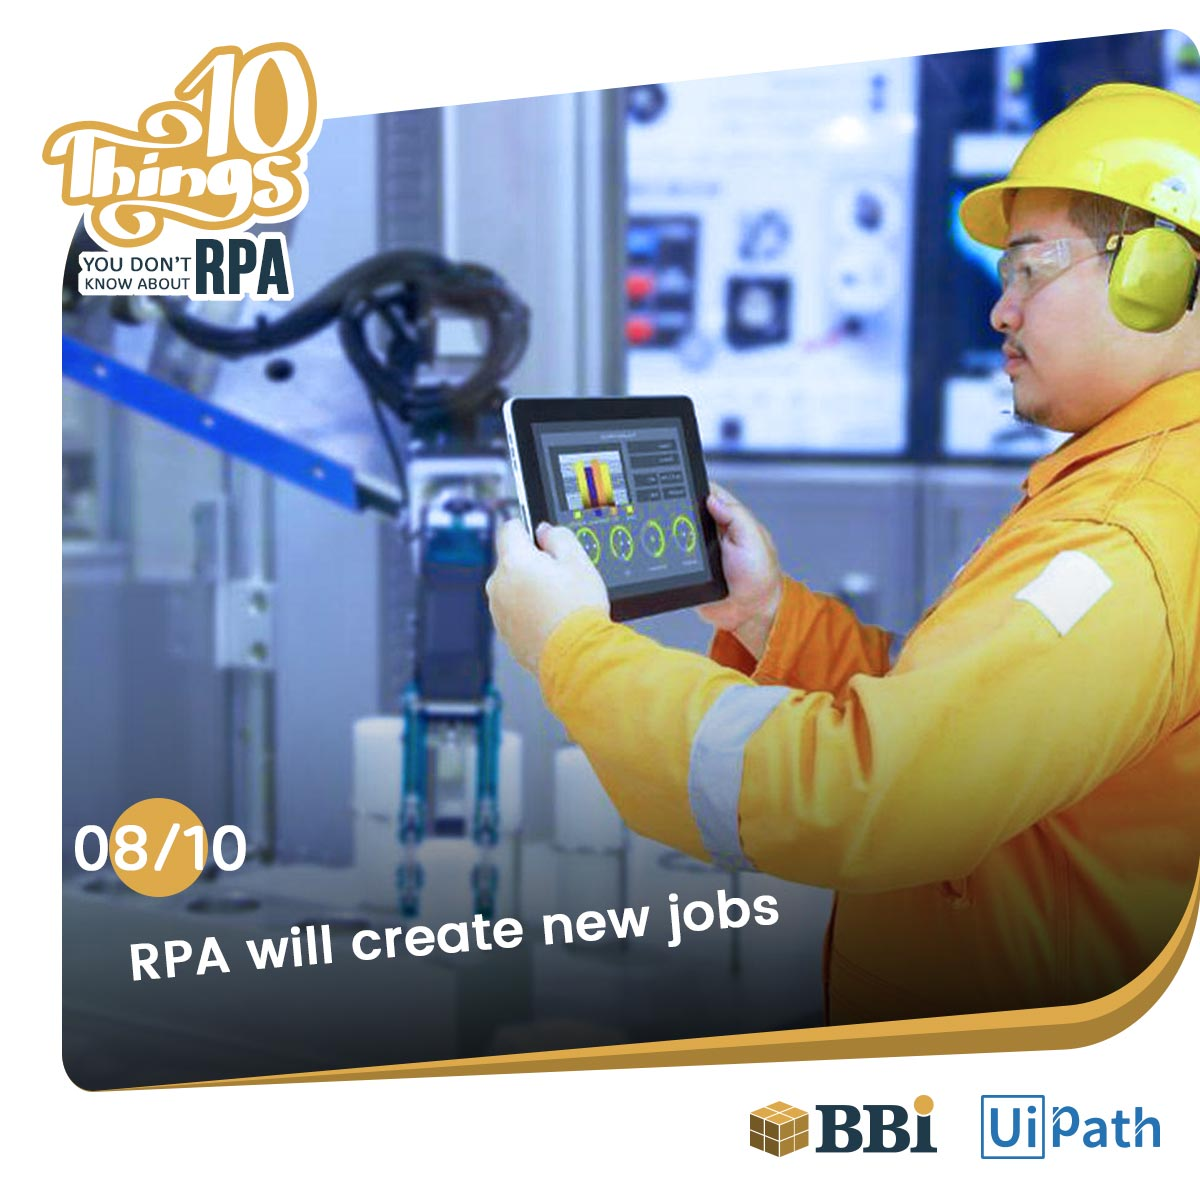 RPA technology Creates New Jobs